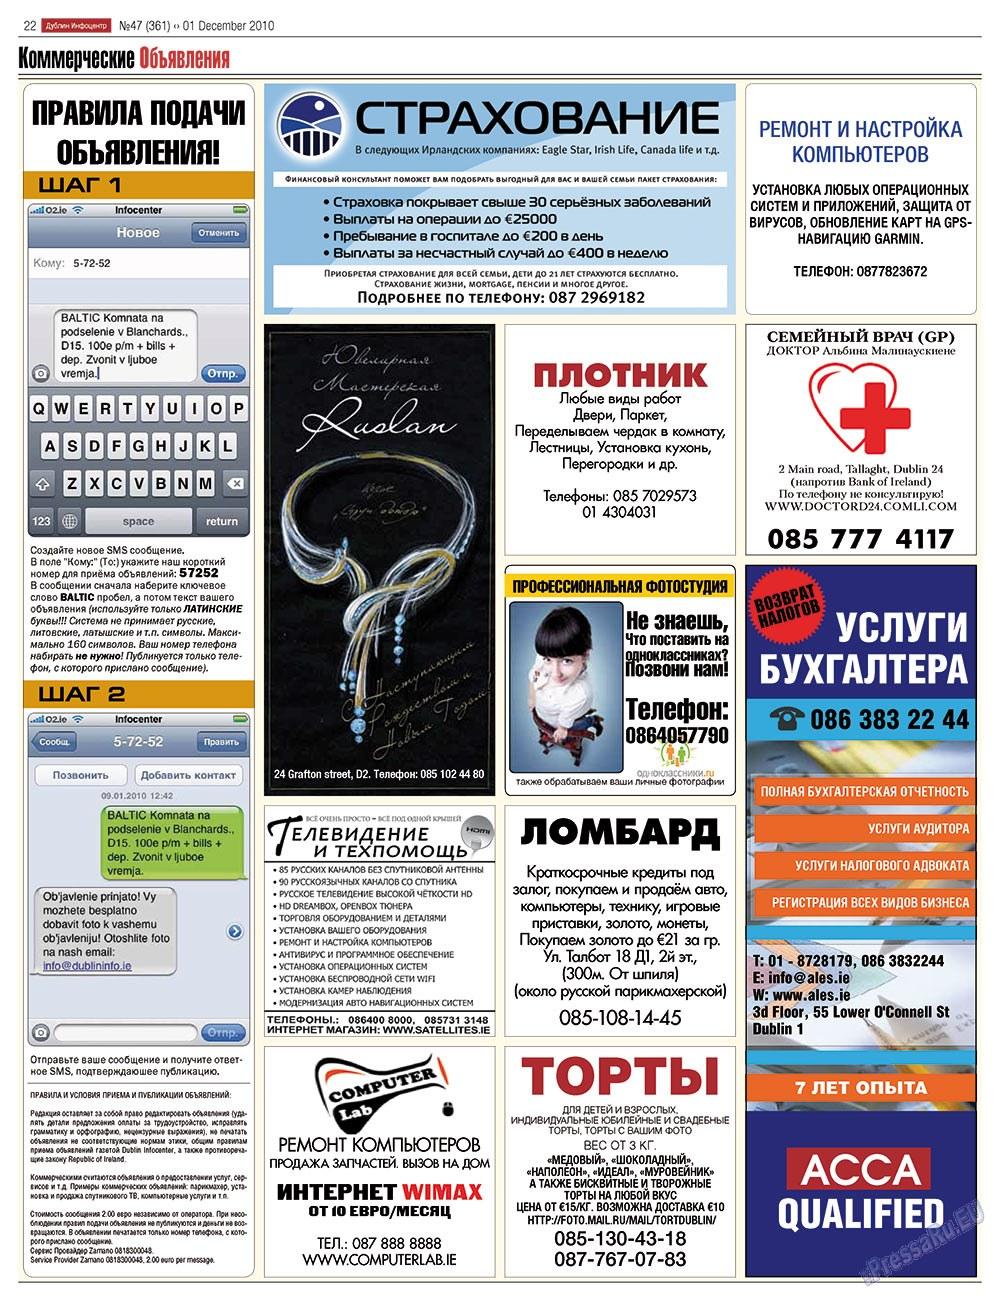 Дублин инфоцентр (газета). 2010 год, номер 47, стр. 22